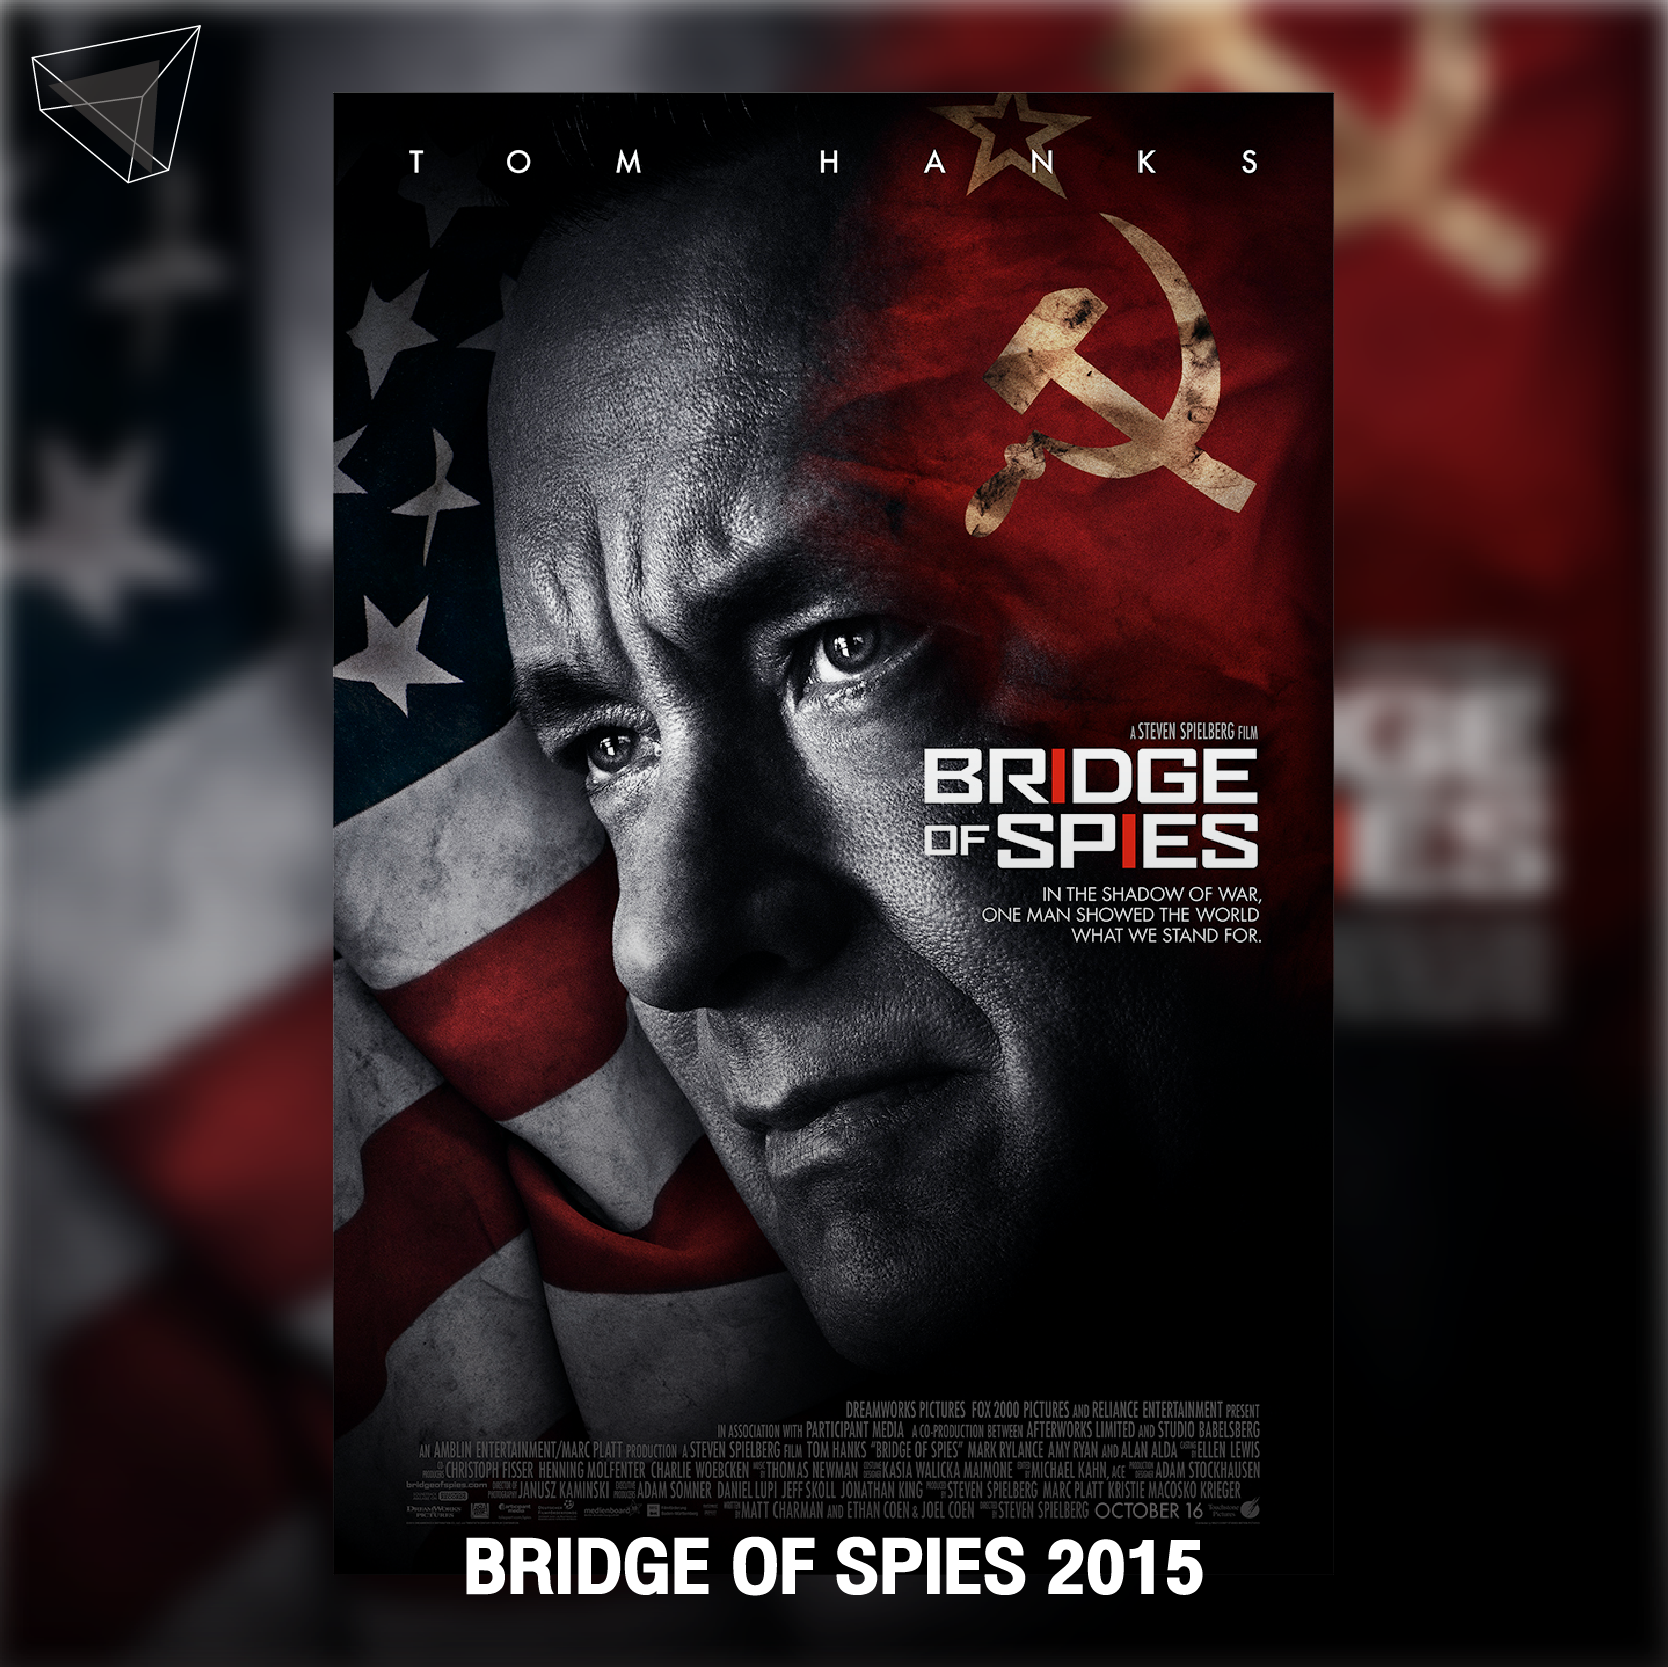 """Bridge of Spies"" (2015) หนังสายลับอิงประวัติศาสตร์"